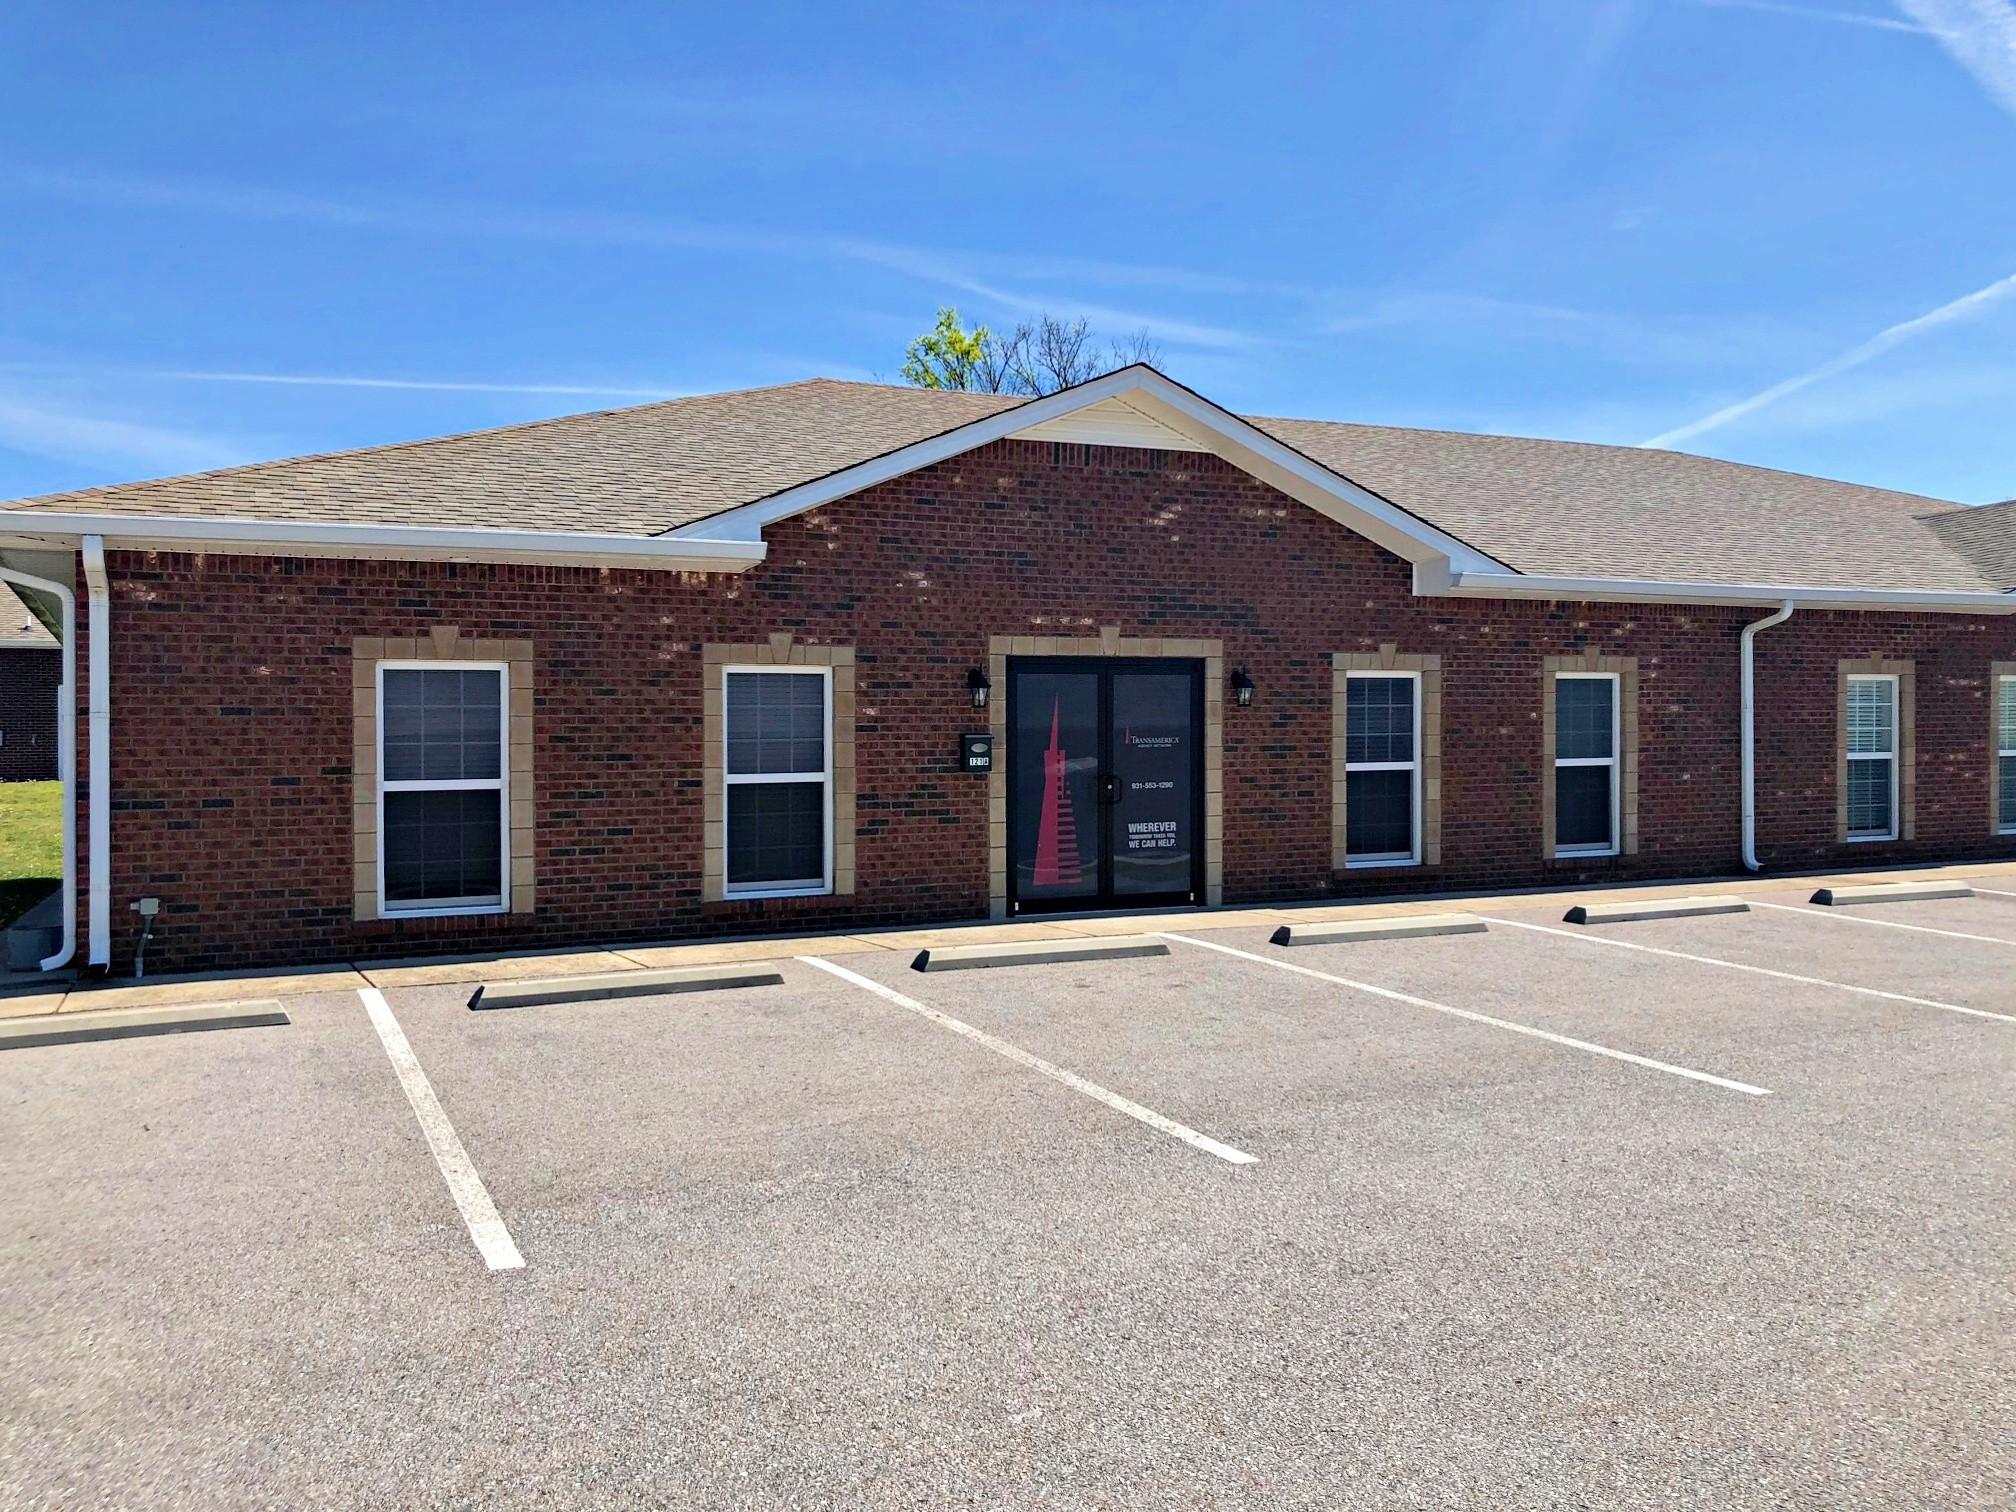 121 Hatcher Ln Property Photo - Clarksville, TN real estate listing